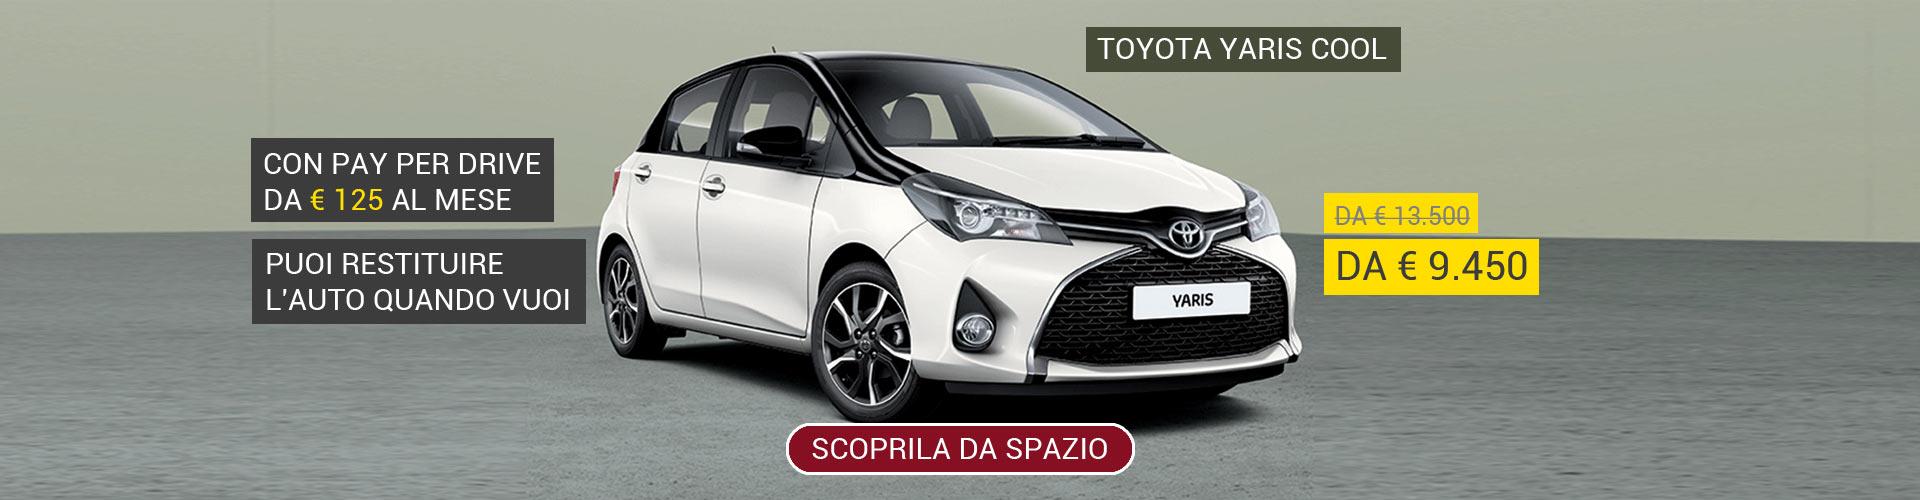 Toyota Yaris Cool